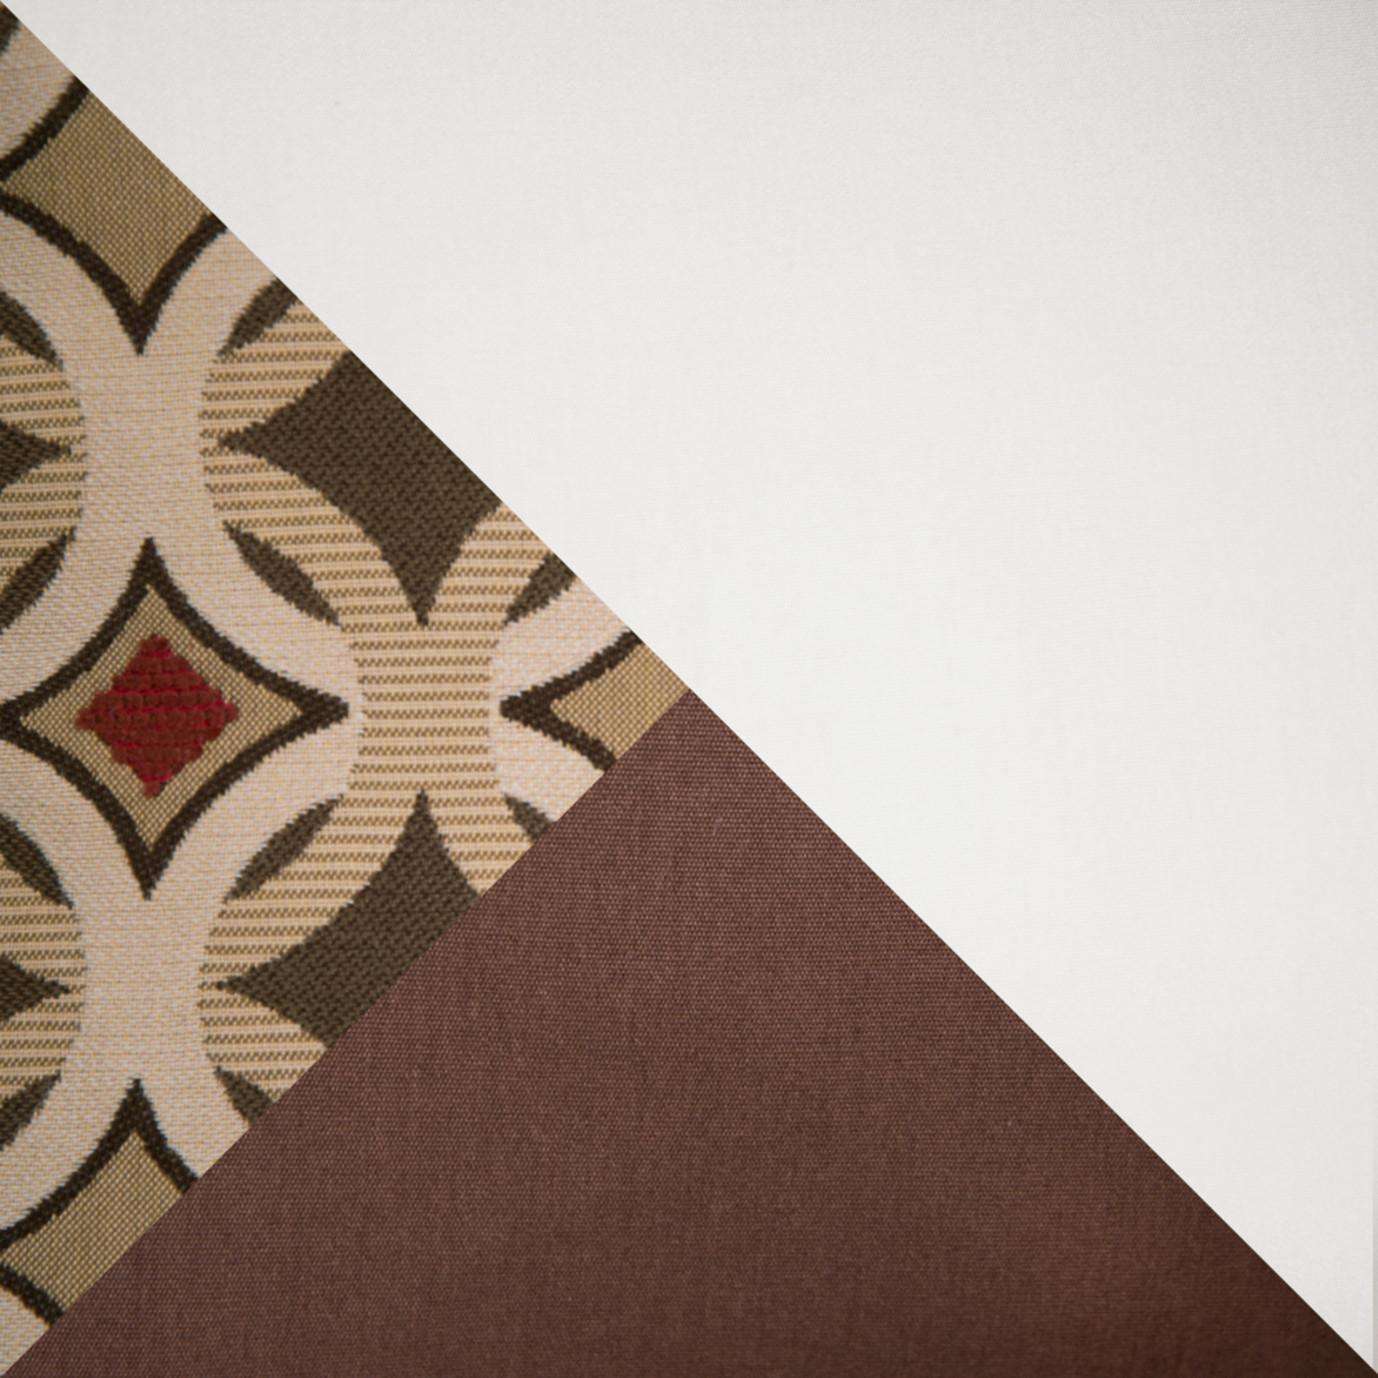 Deco™ 8pc Sofa and Club Chair Set - Moroccan Cream